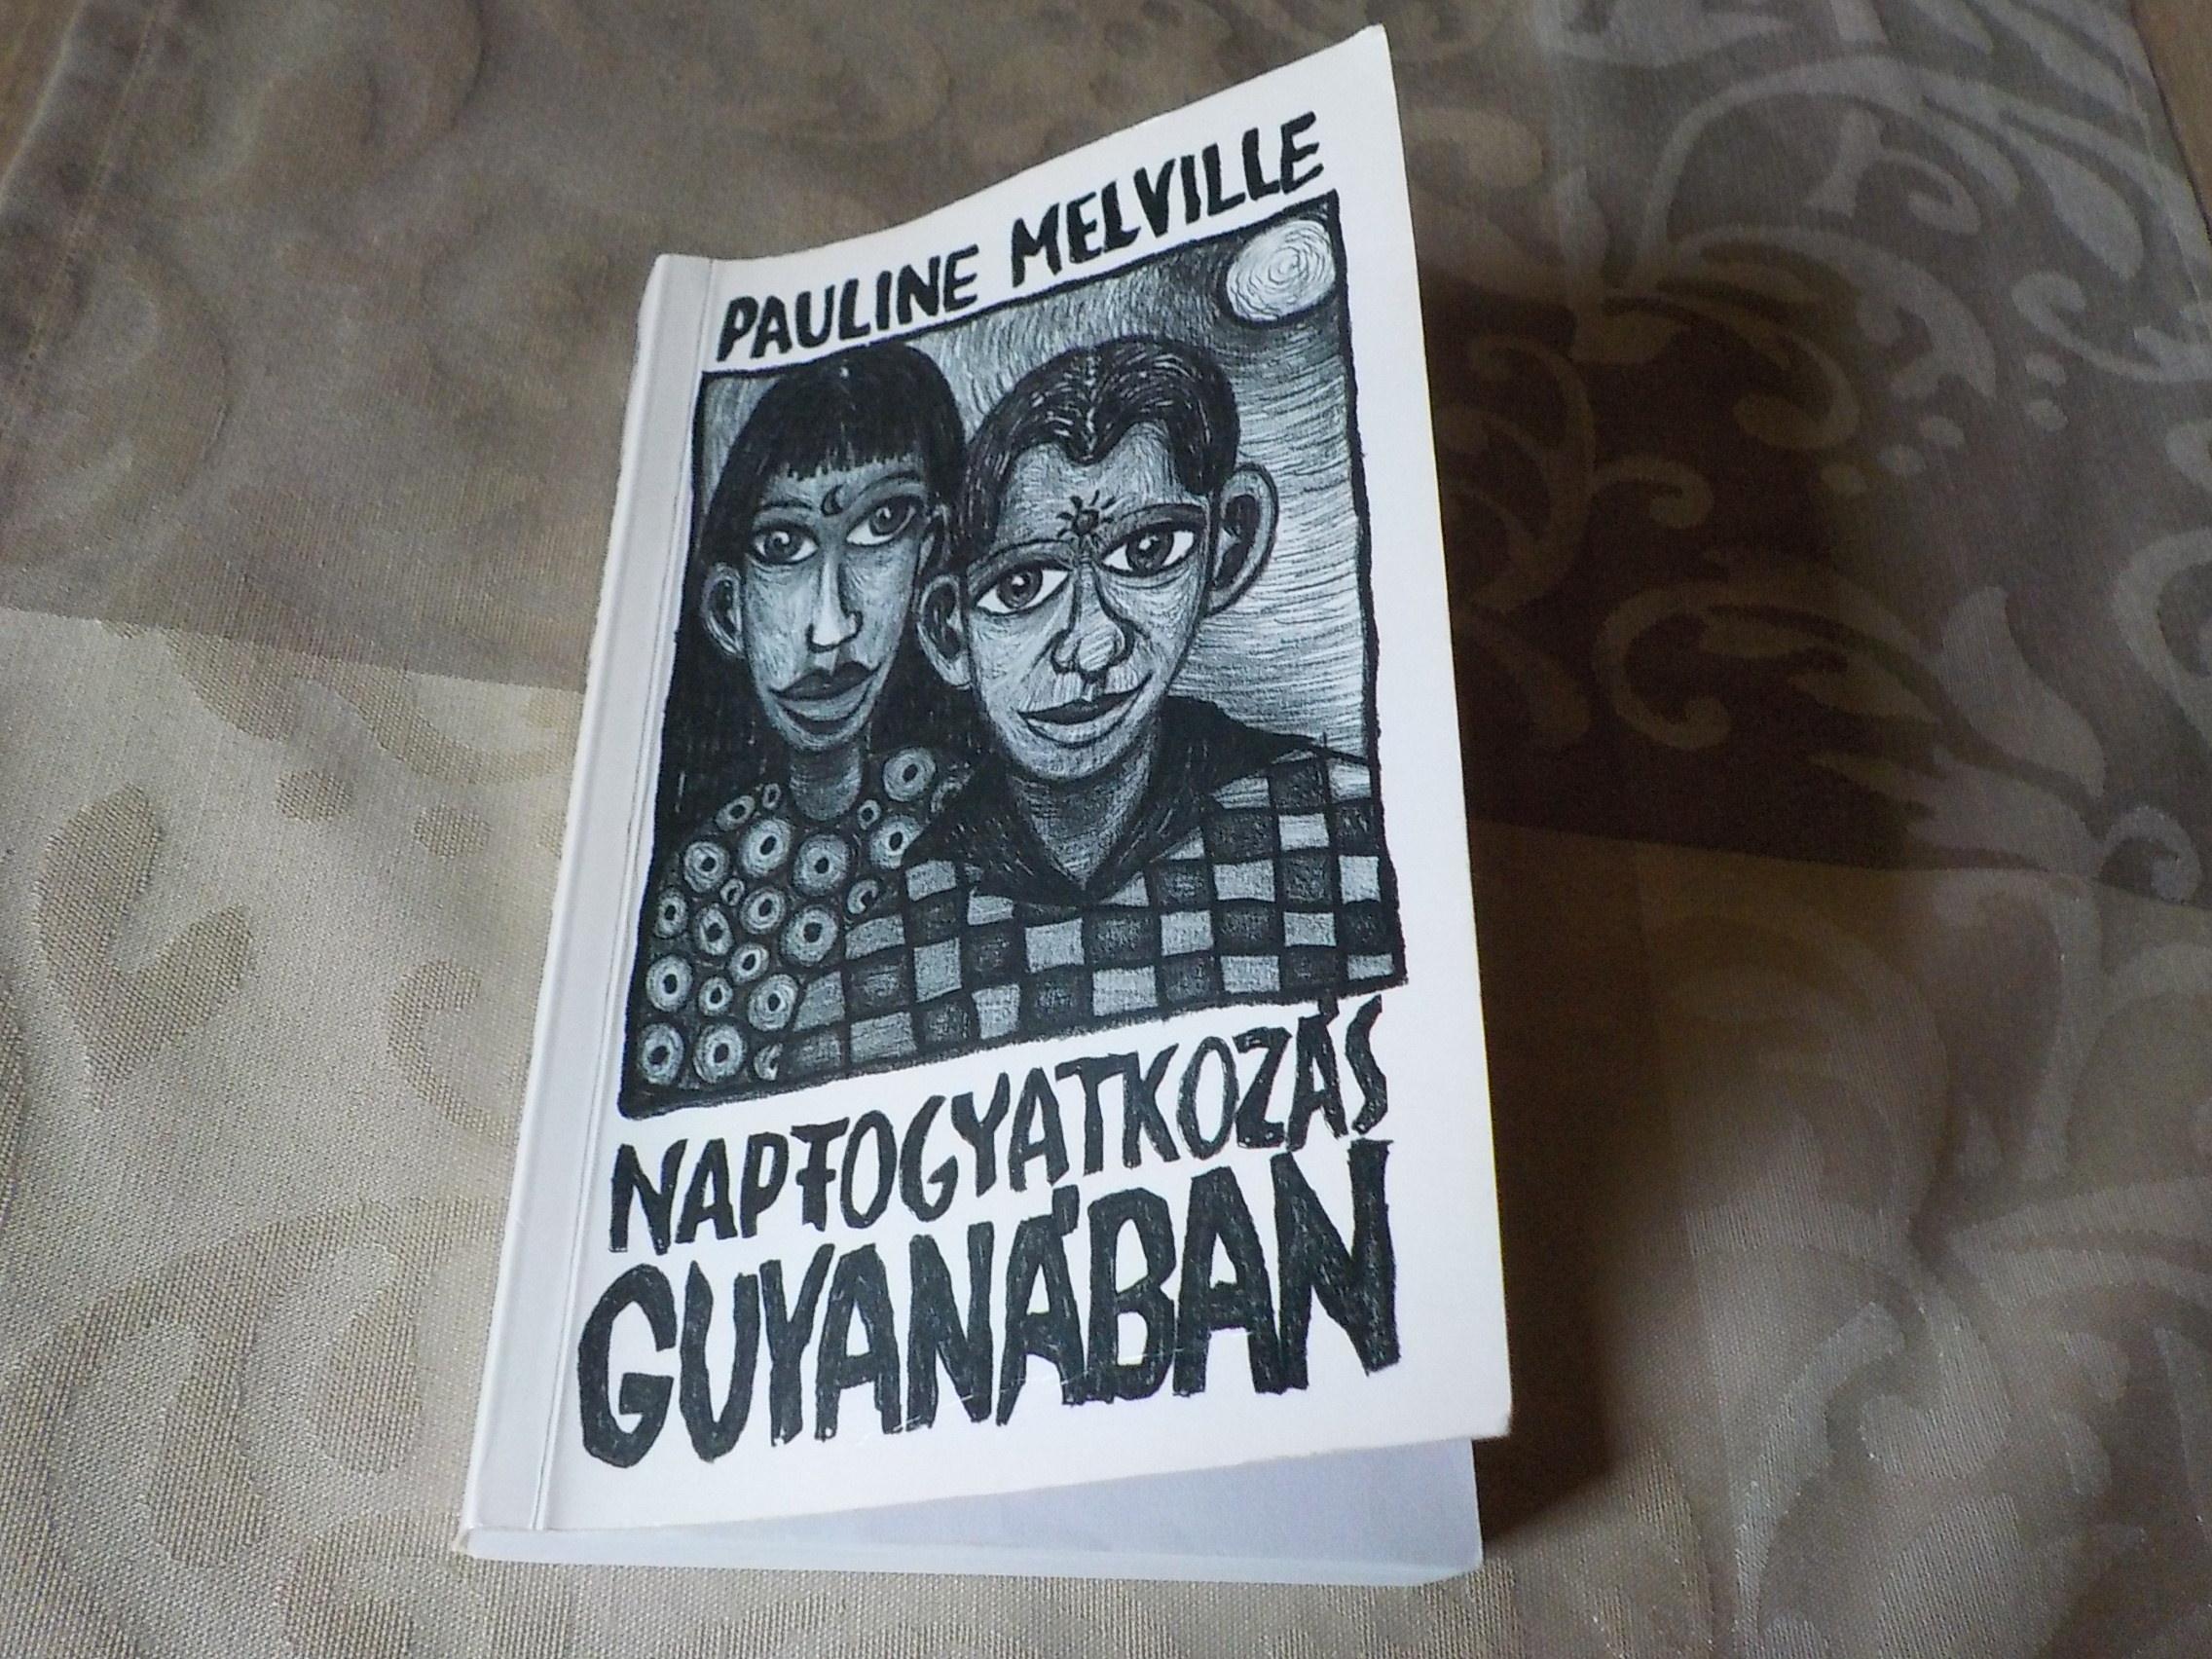 pauline_melville_napfogyatkozas_guyanaban.JPG